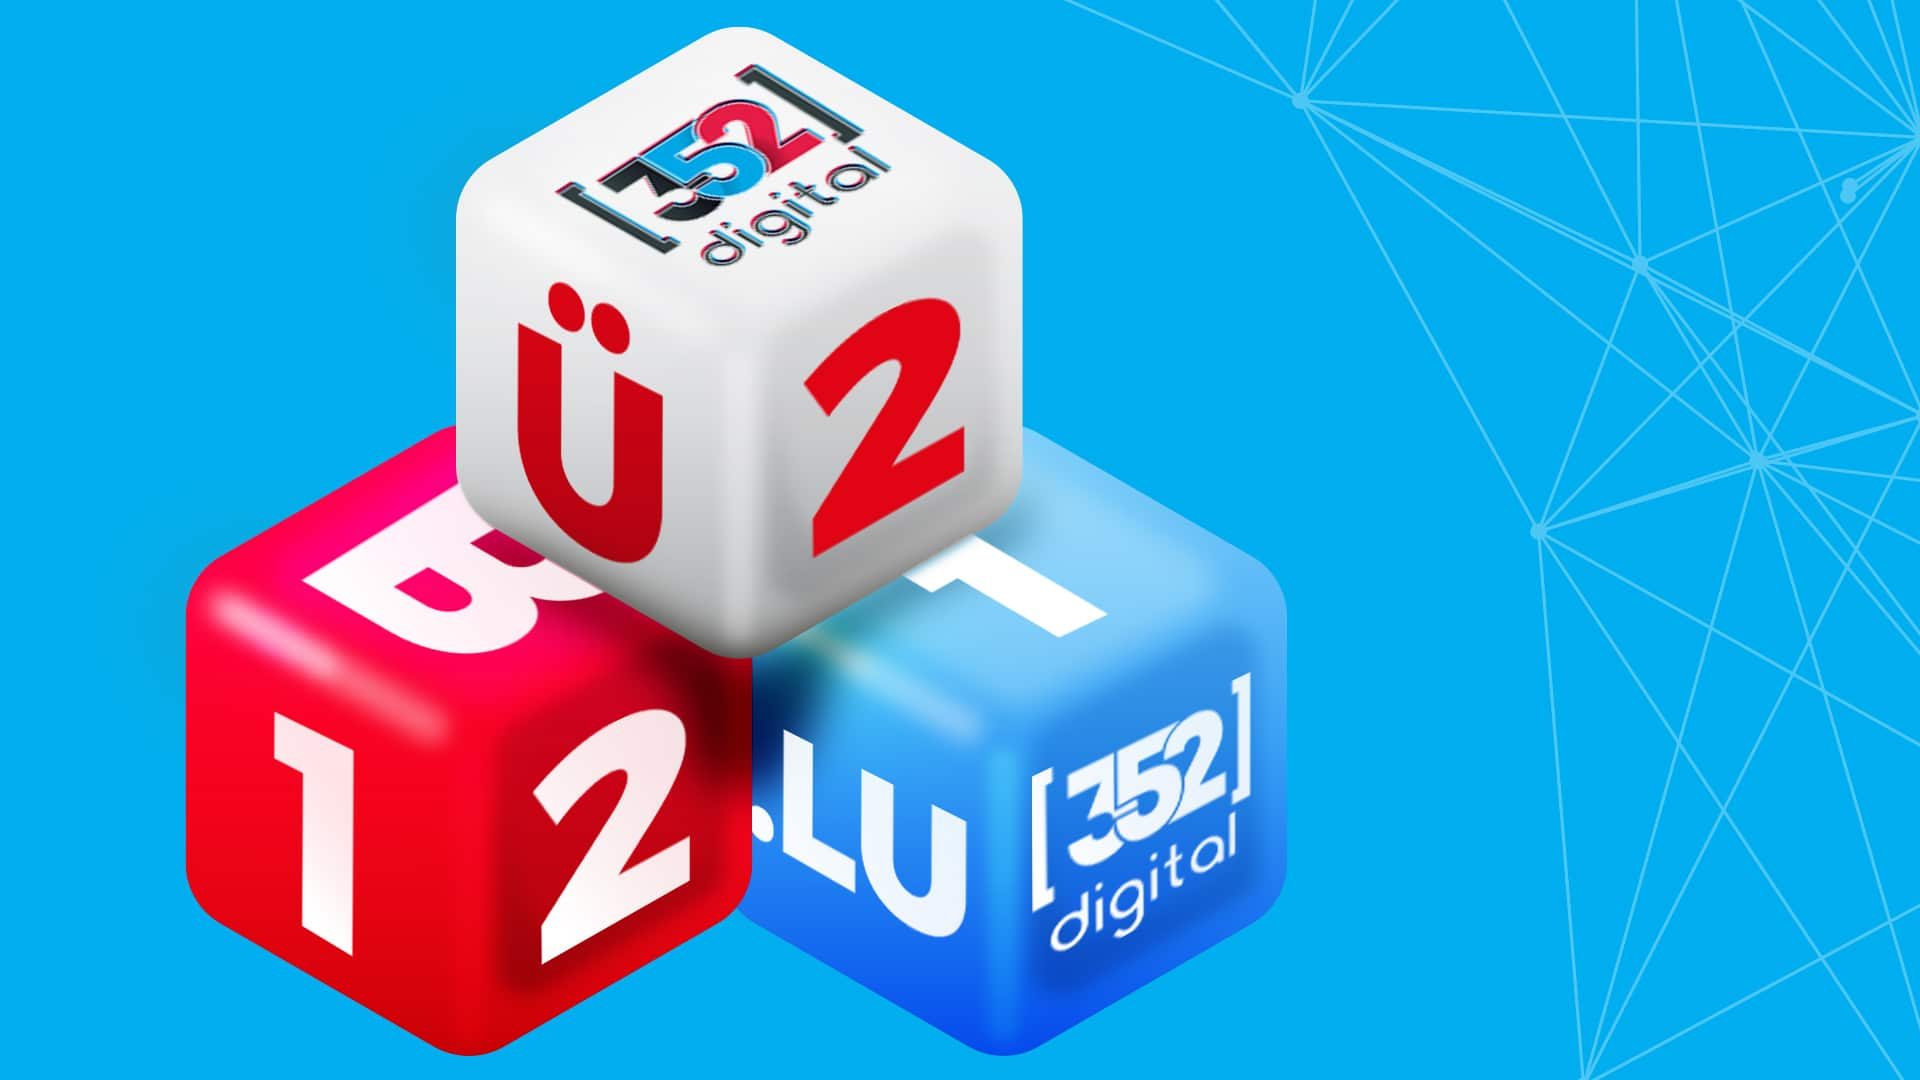 1 and 2 .lu dice